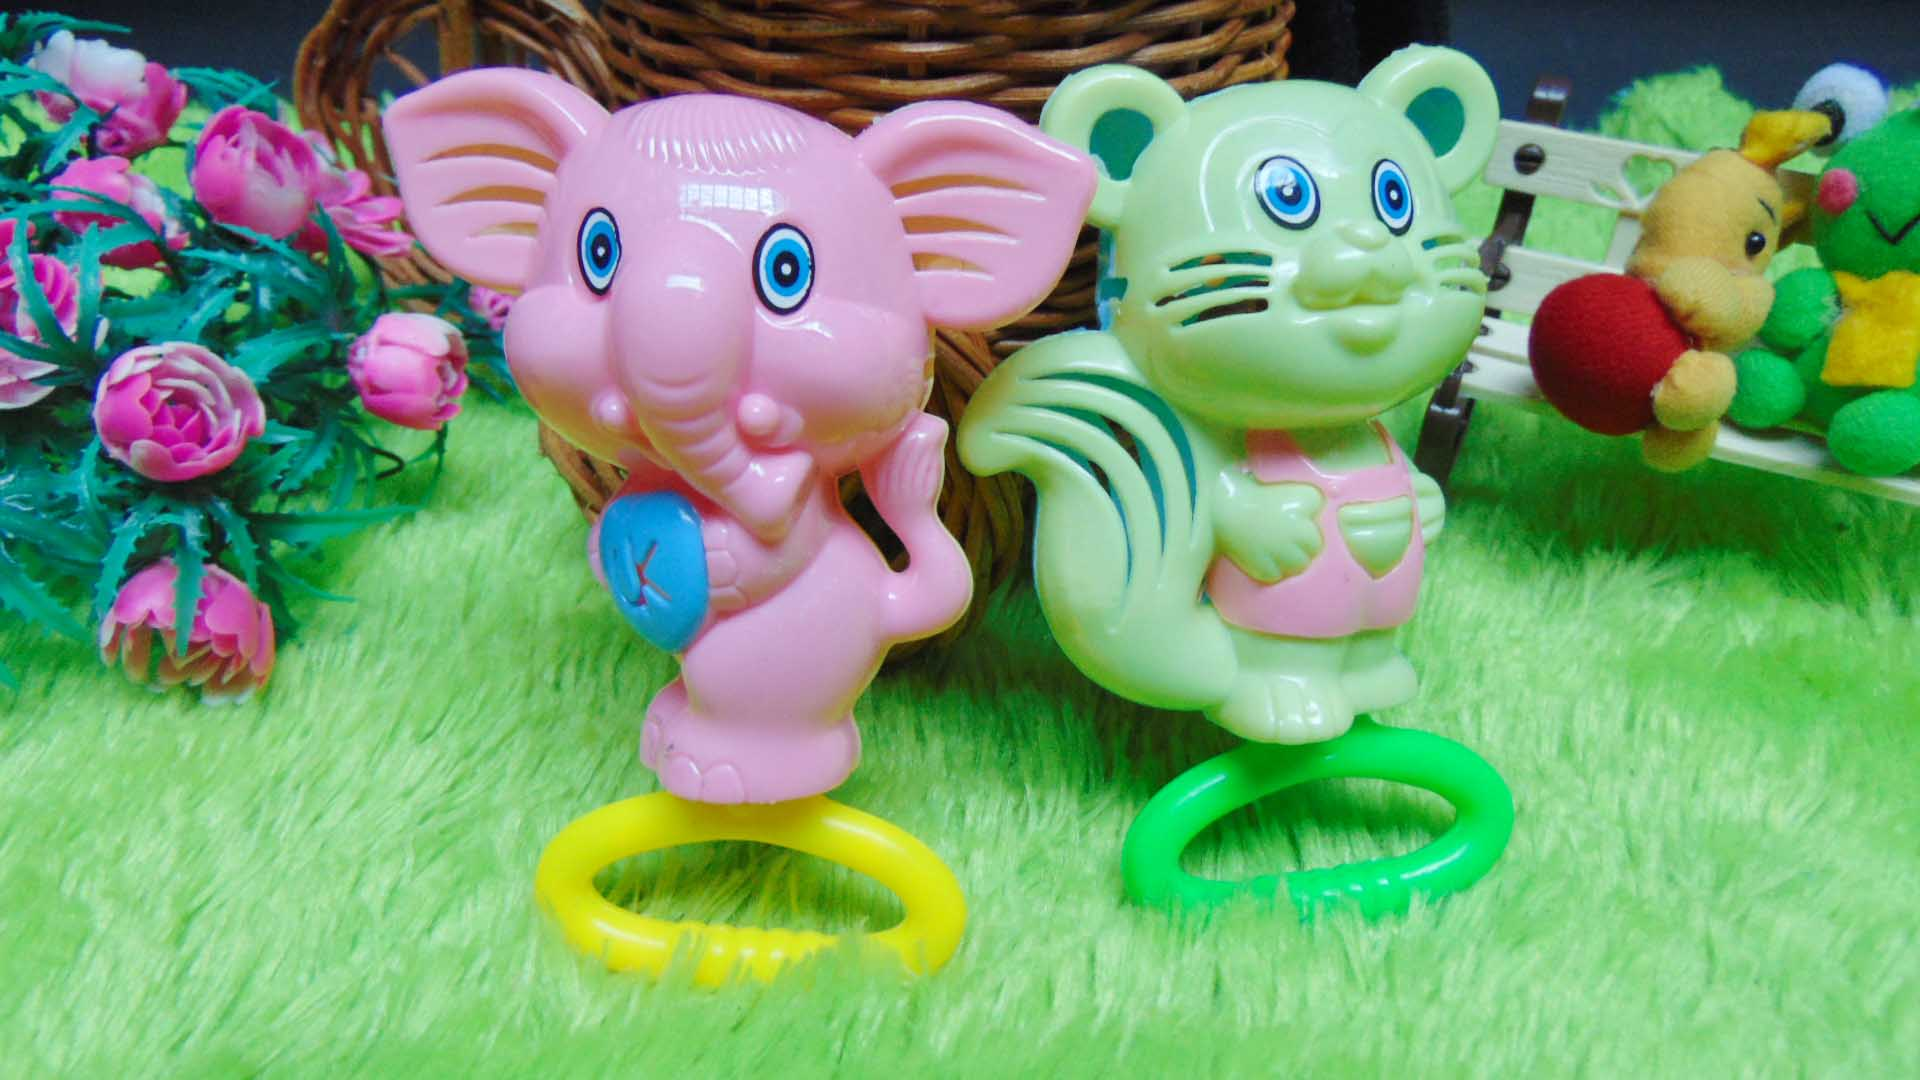 kado bayi murah set 2in1 mainan bayi rattle icik-icik krincingan double gajah tupai pink hijau